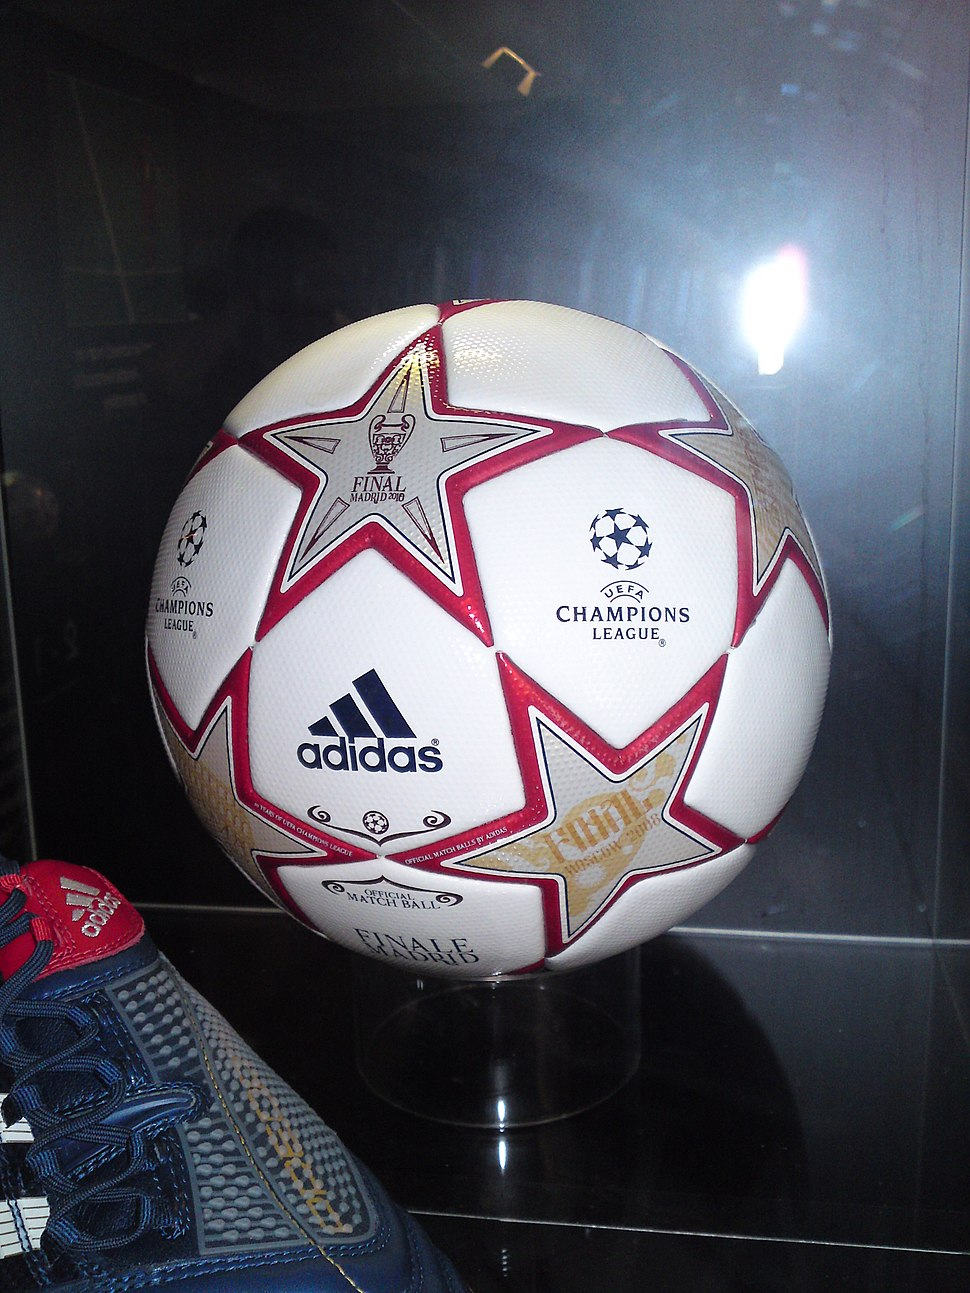 2010 UEFA Champions League Final ball